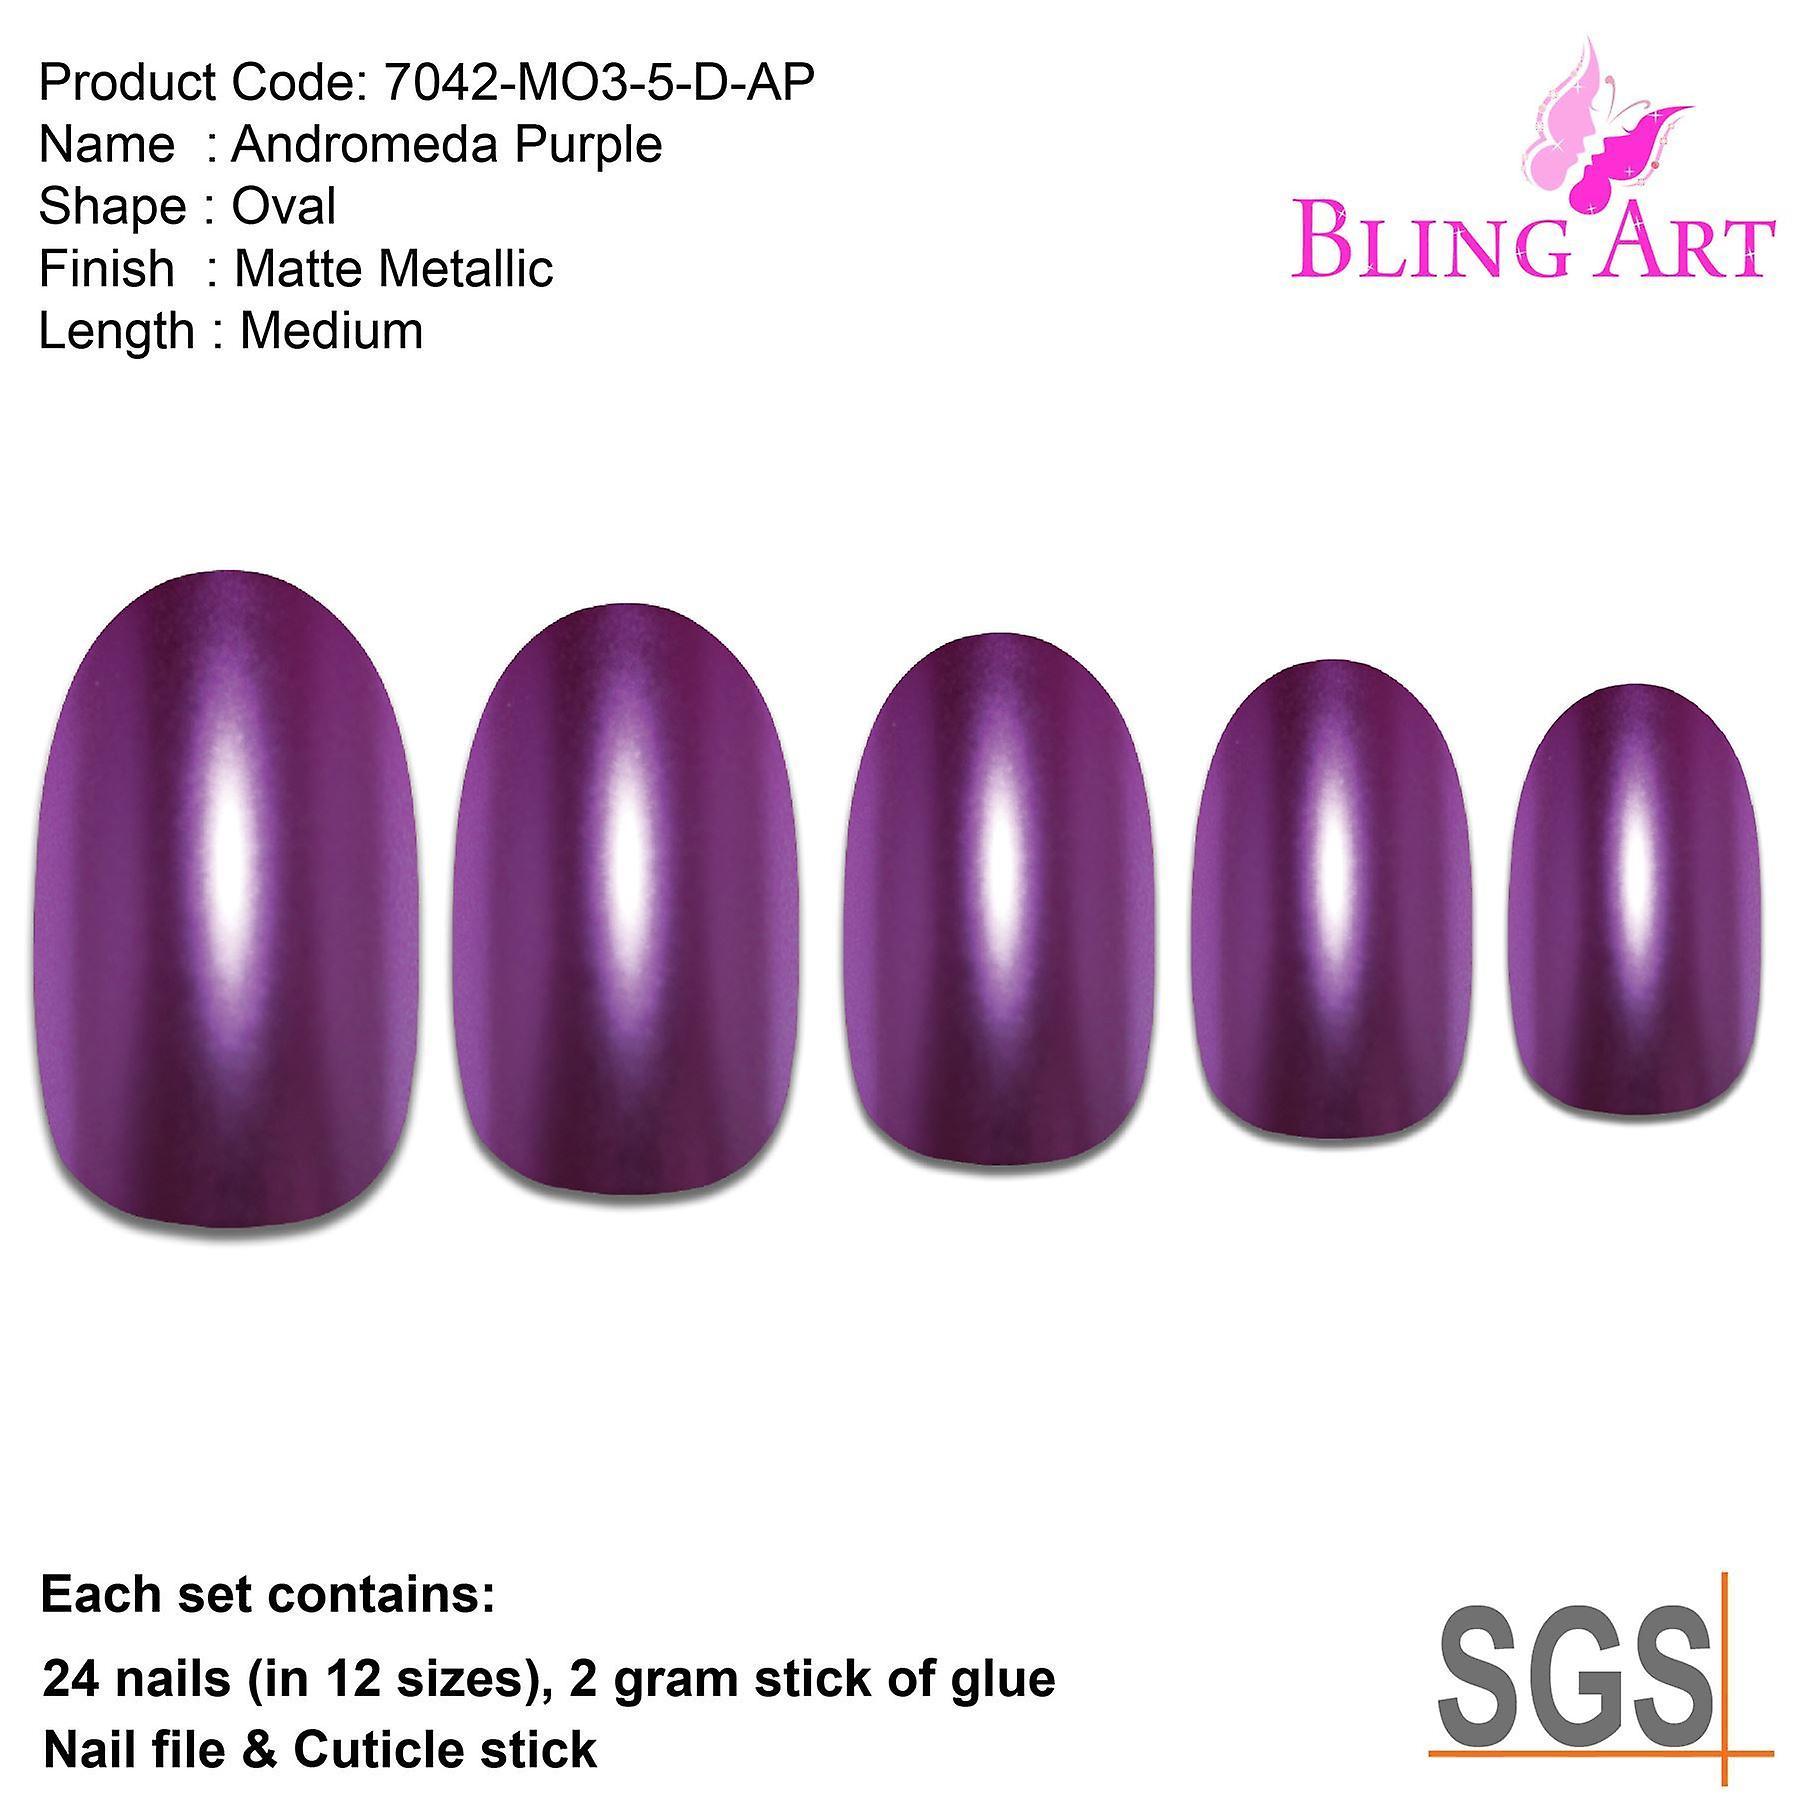 False nails by bling art purple matte metallic oval medium fake acrylic 24 tips